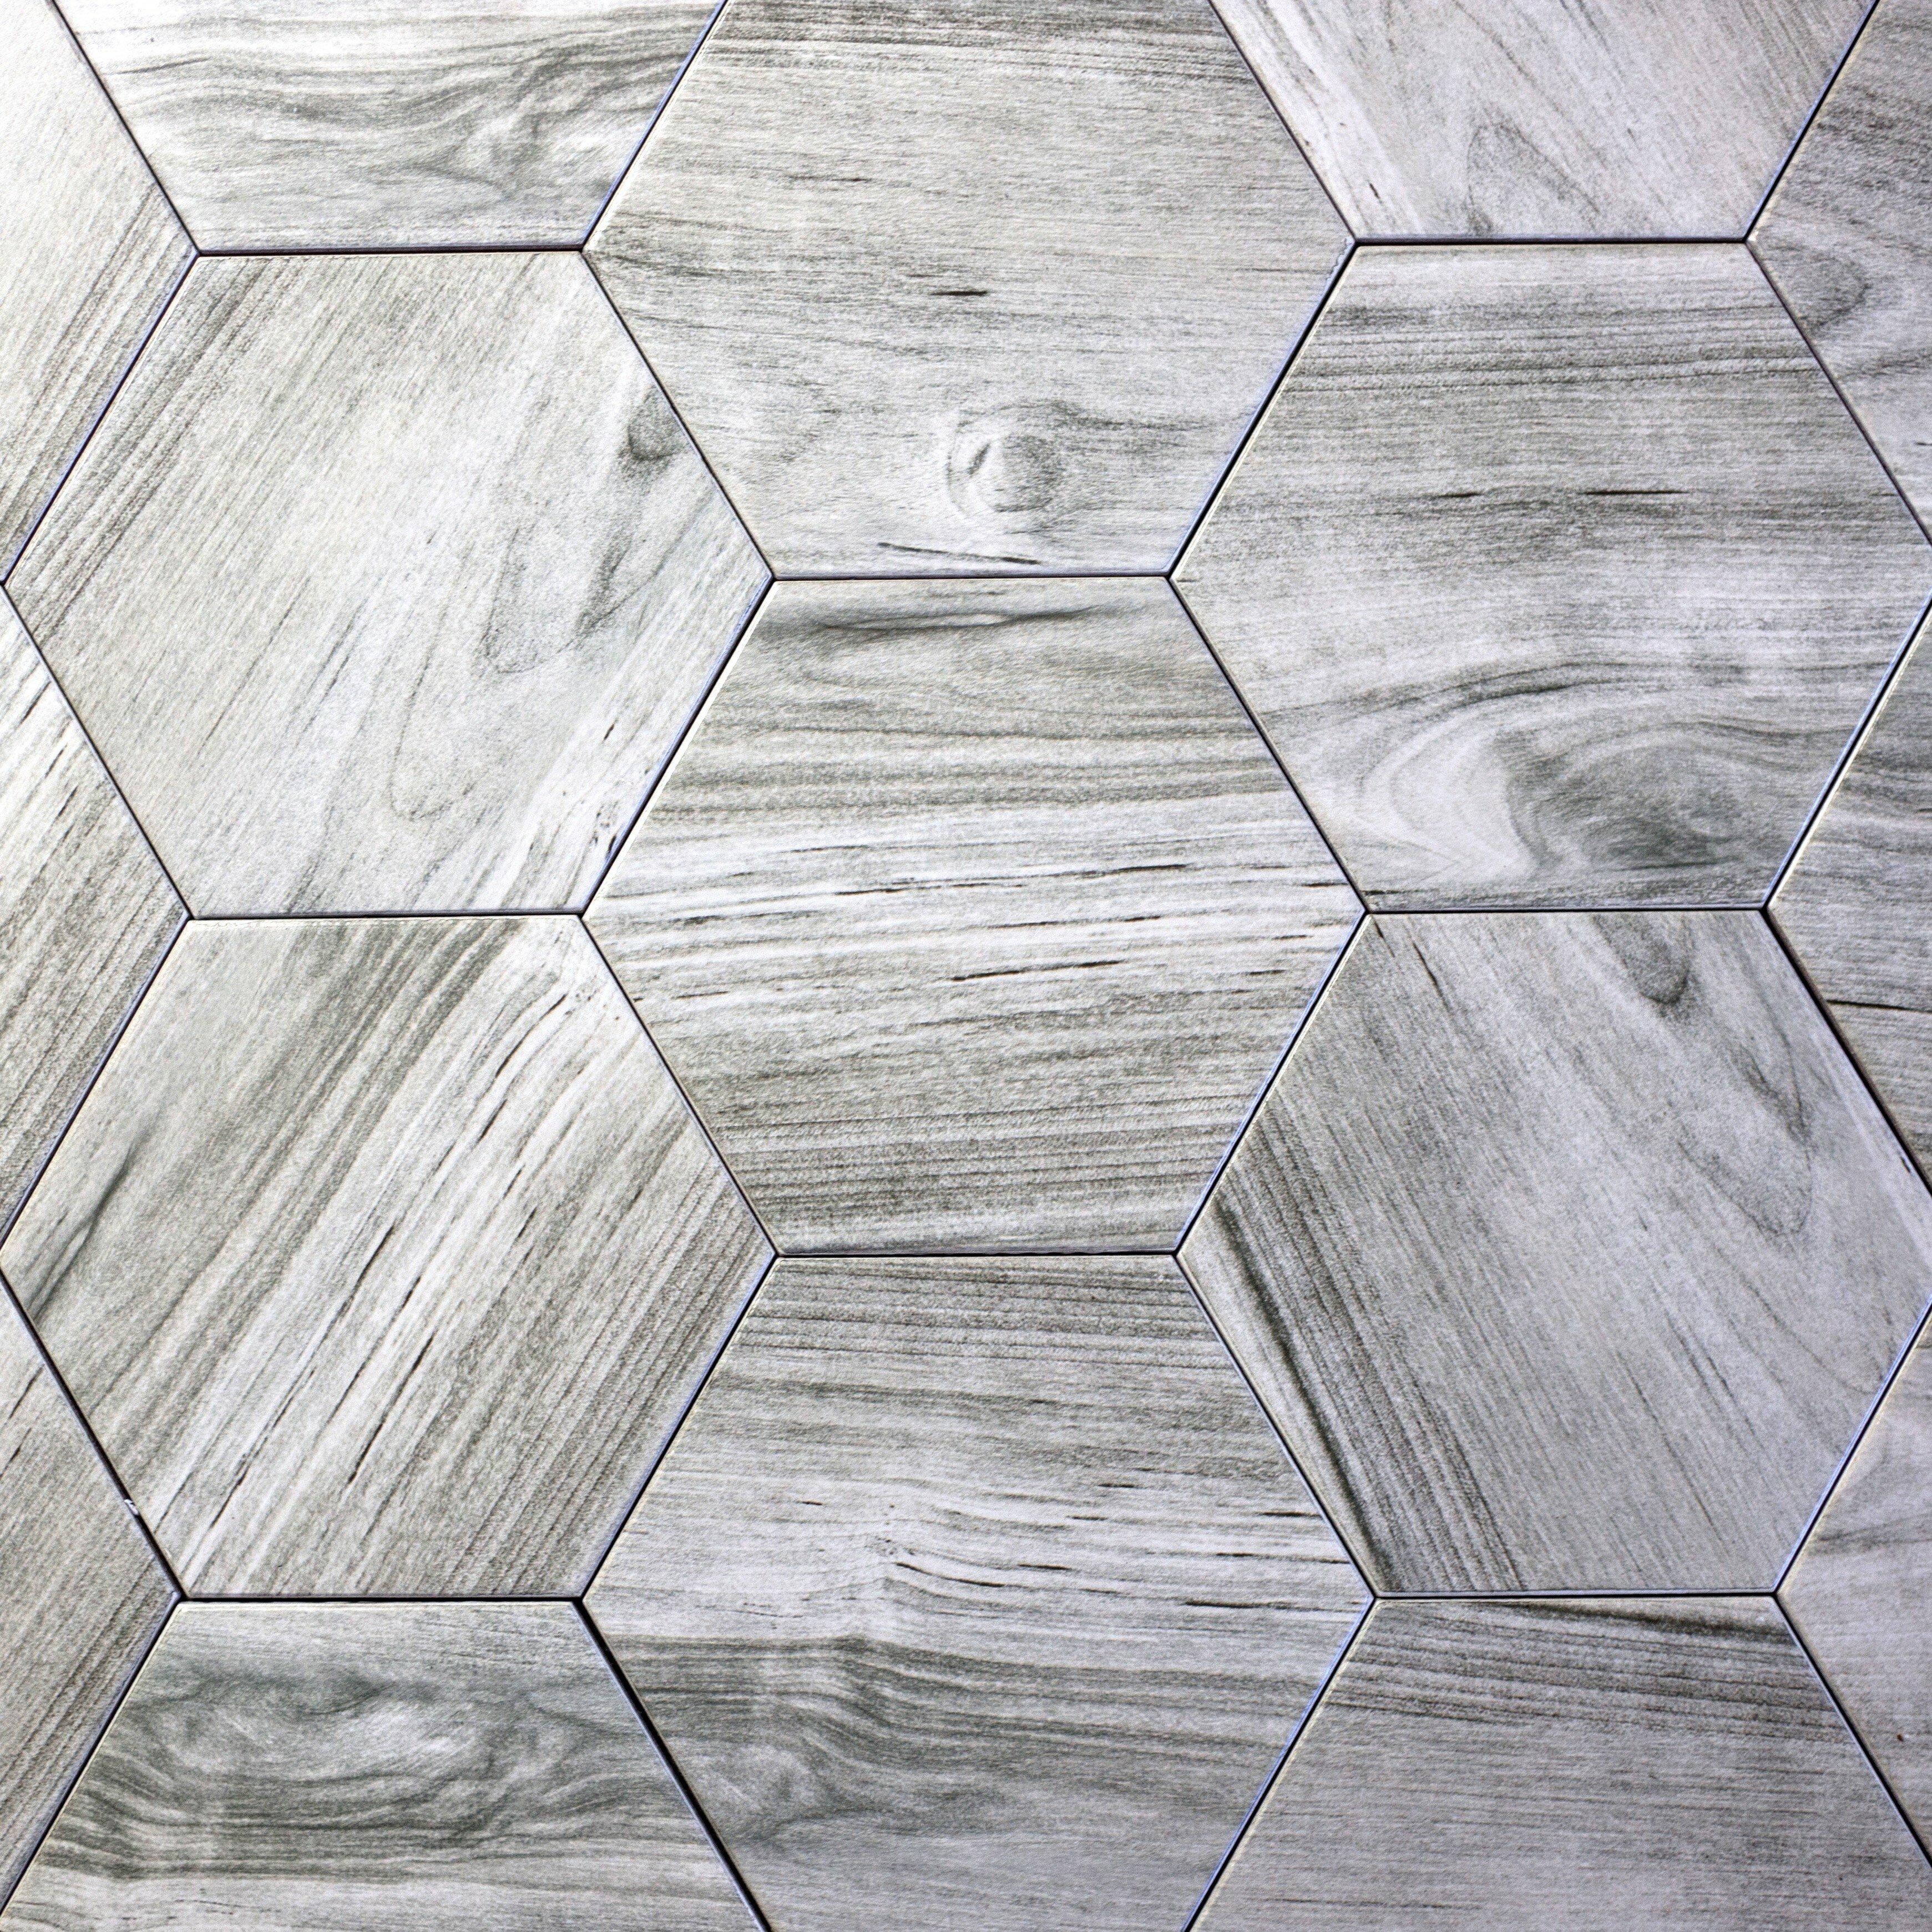 Rustic Country Bedroom Ideas Abolos Artisan Wood Hexagon 8 Quot X 8 Quot Ceramic Wood Look Tile